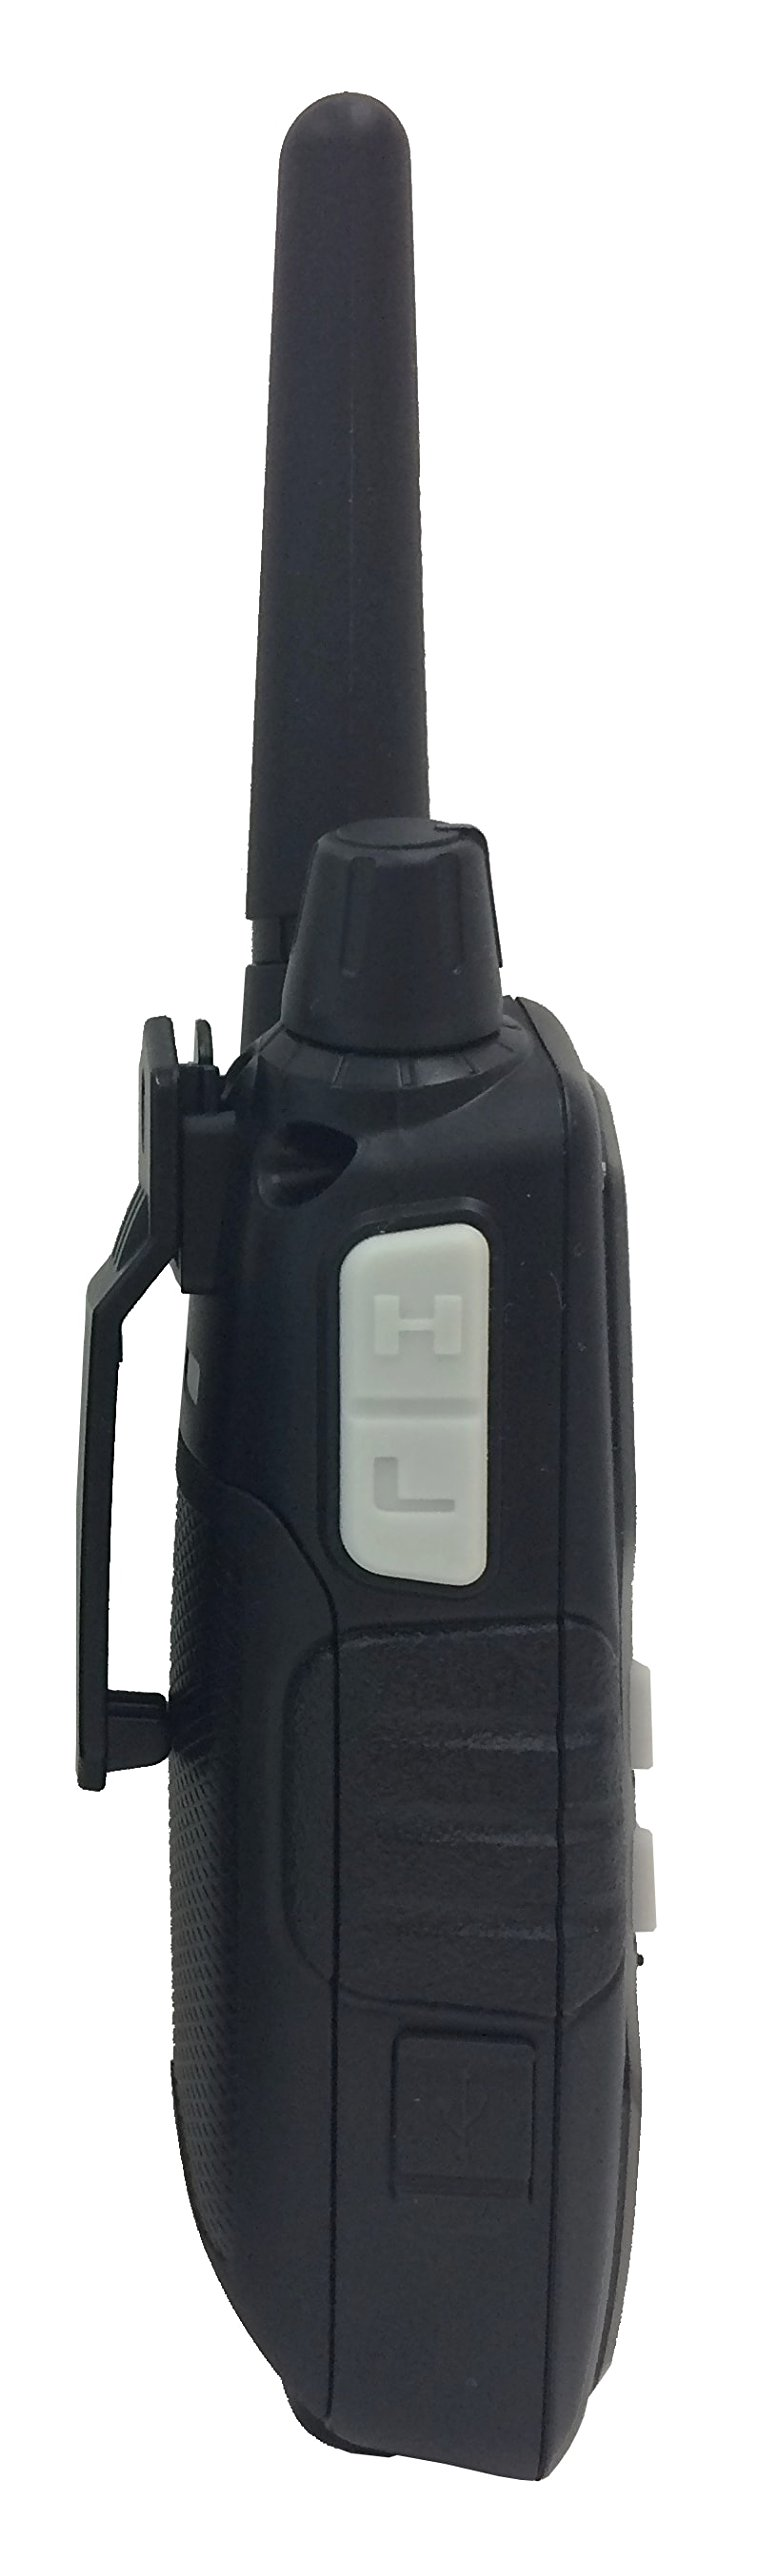 Cobra CXY900 Walkie Talkies 40-Mile Two-Way Radios, Rechargeable (Pair) by Cobra (Image #3)